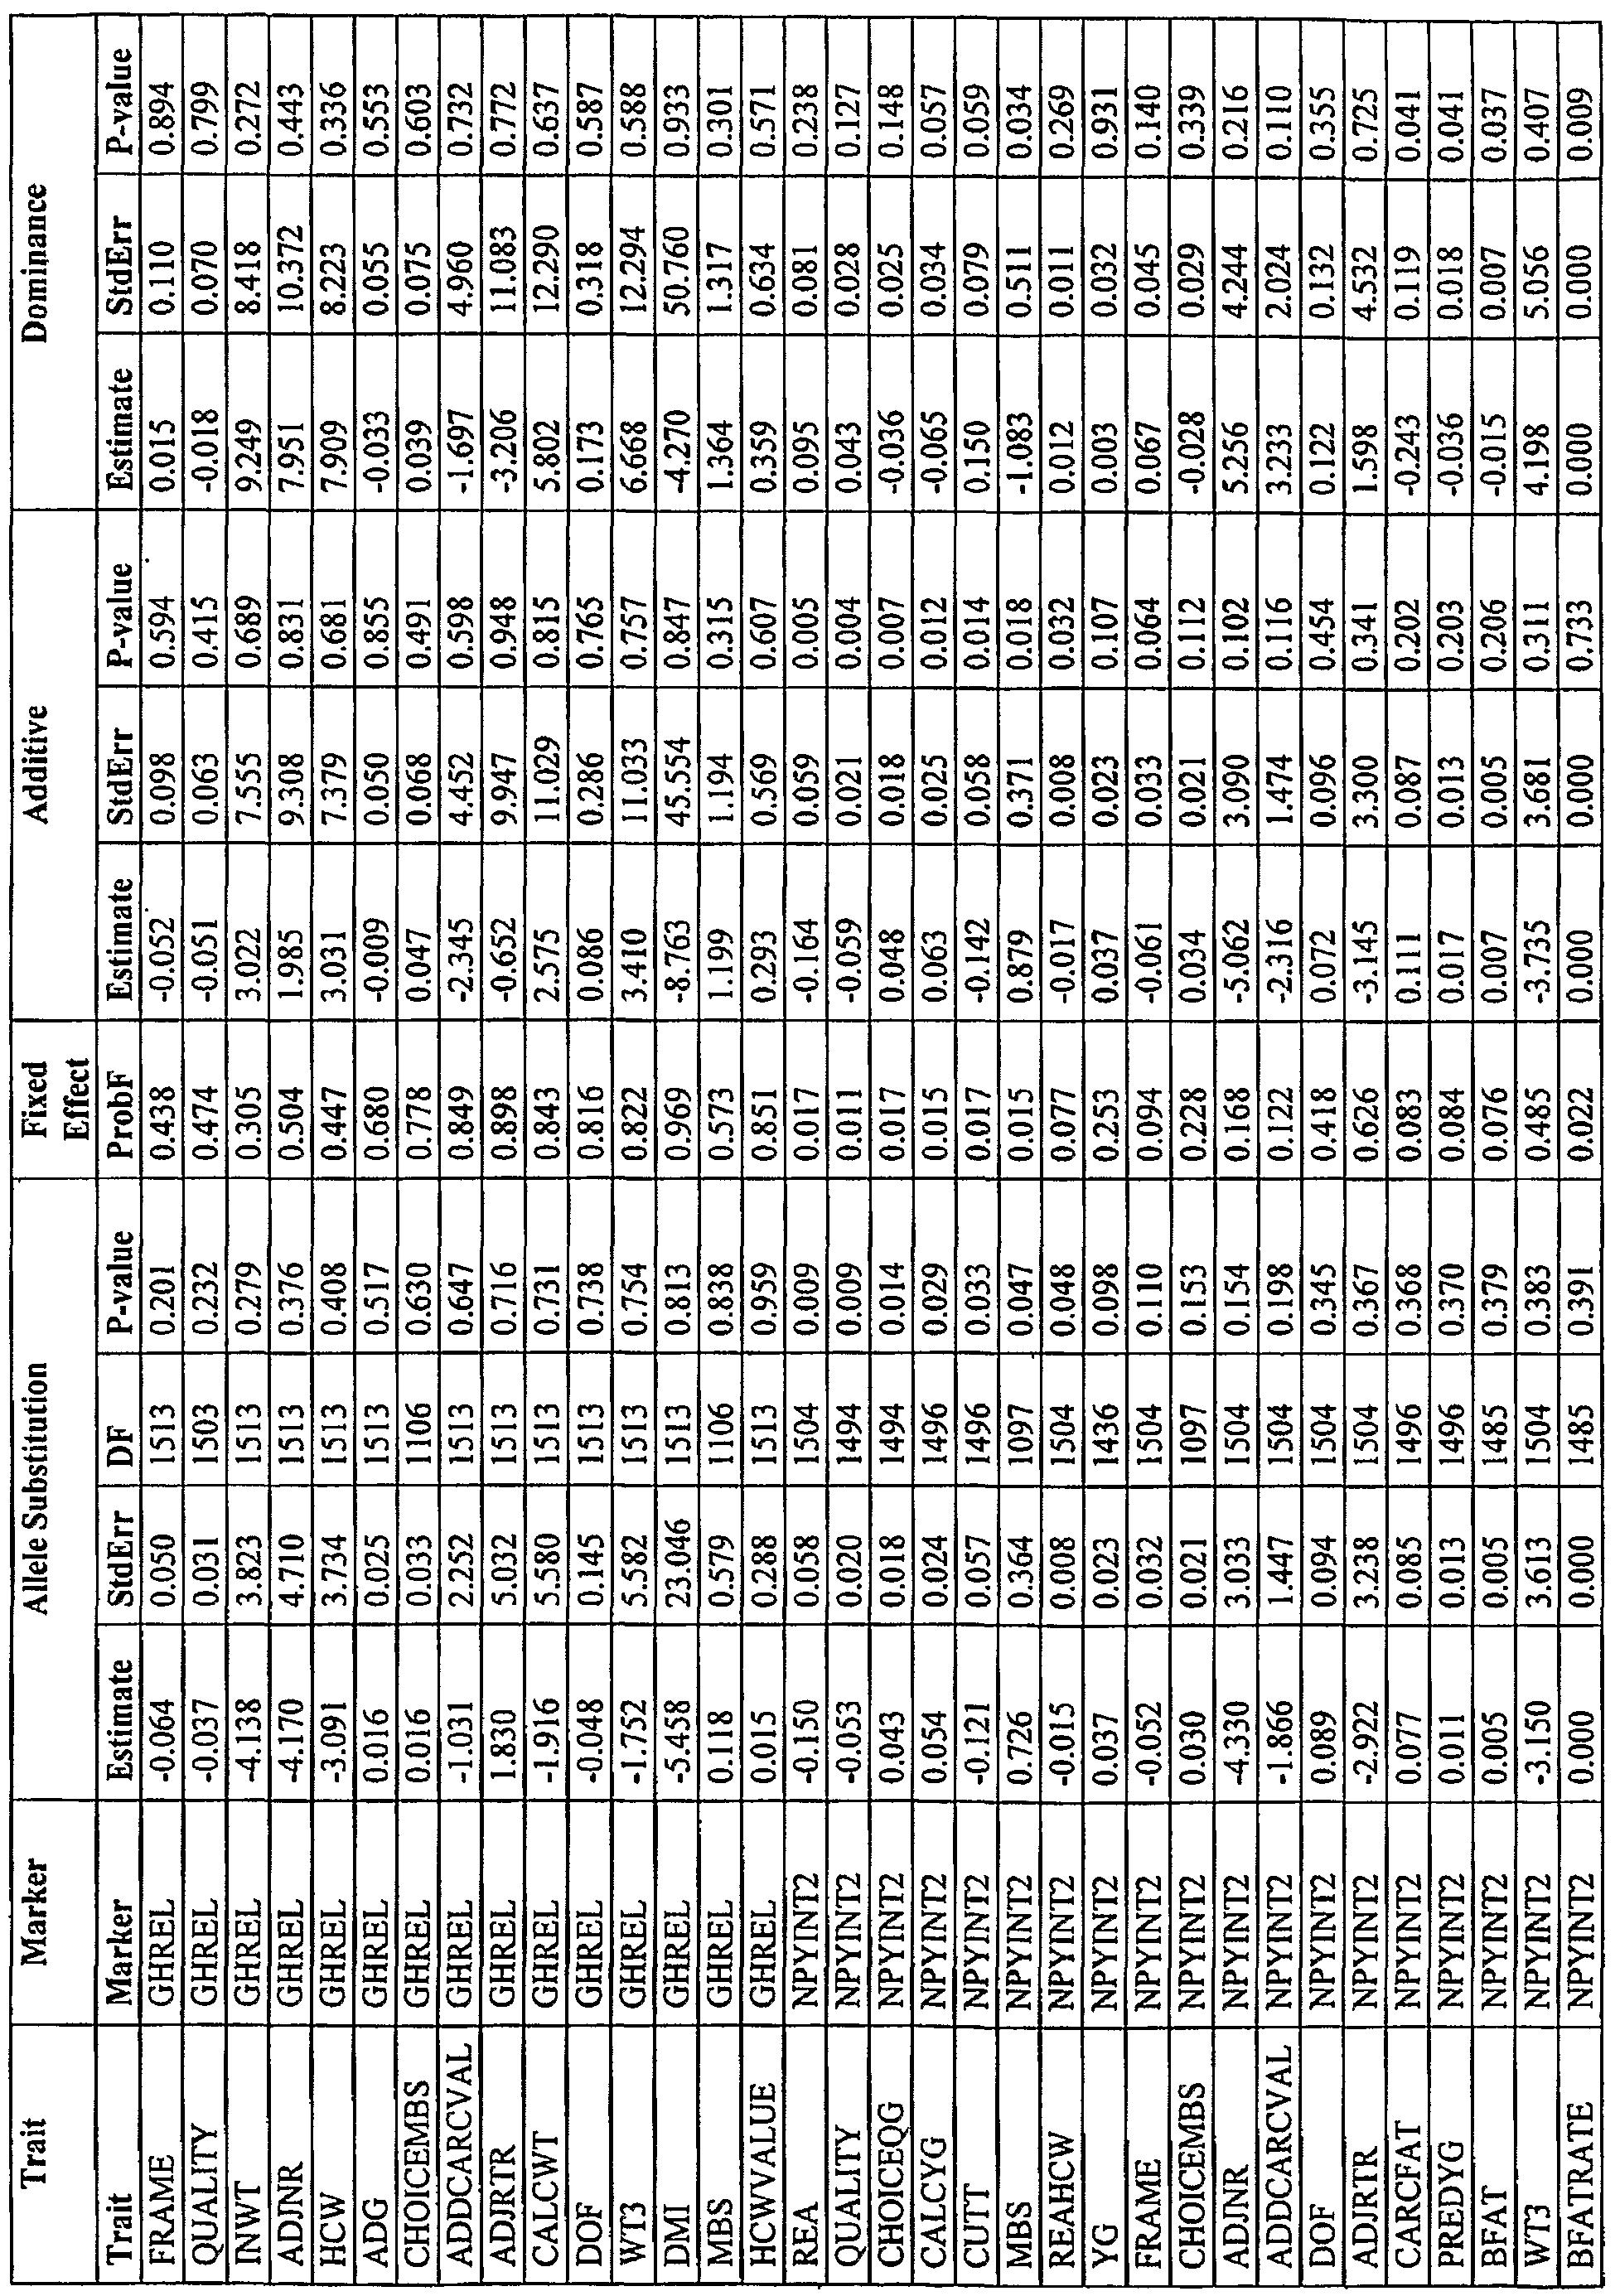 WO2007129219A2 - Polymorphisms in growth hormone receptor, ghrelin